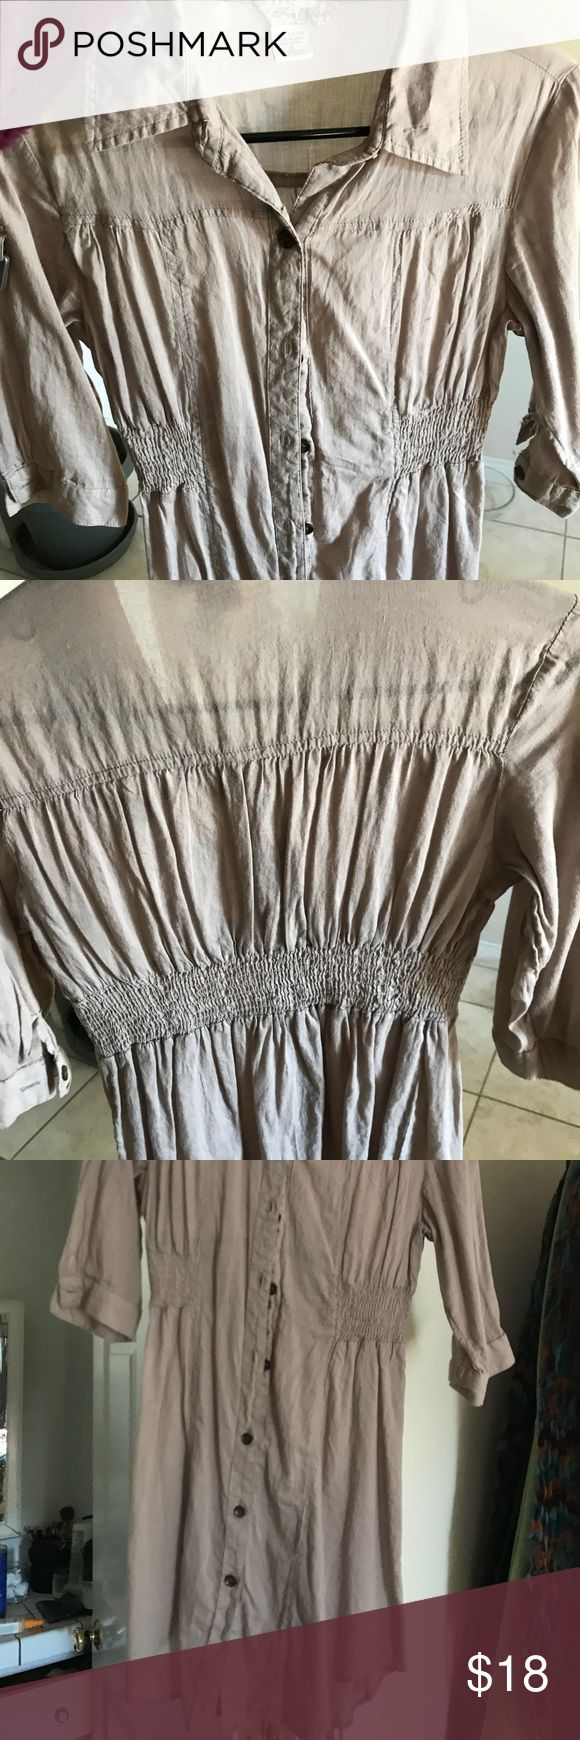 Cover up or layering dress (see thru) Beige  Cute and comfortable  Over bikini or leggings Dresses Midi